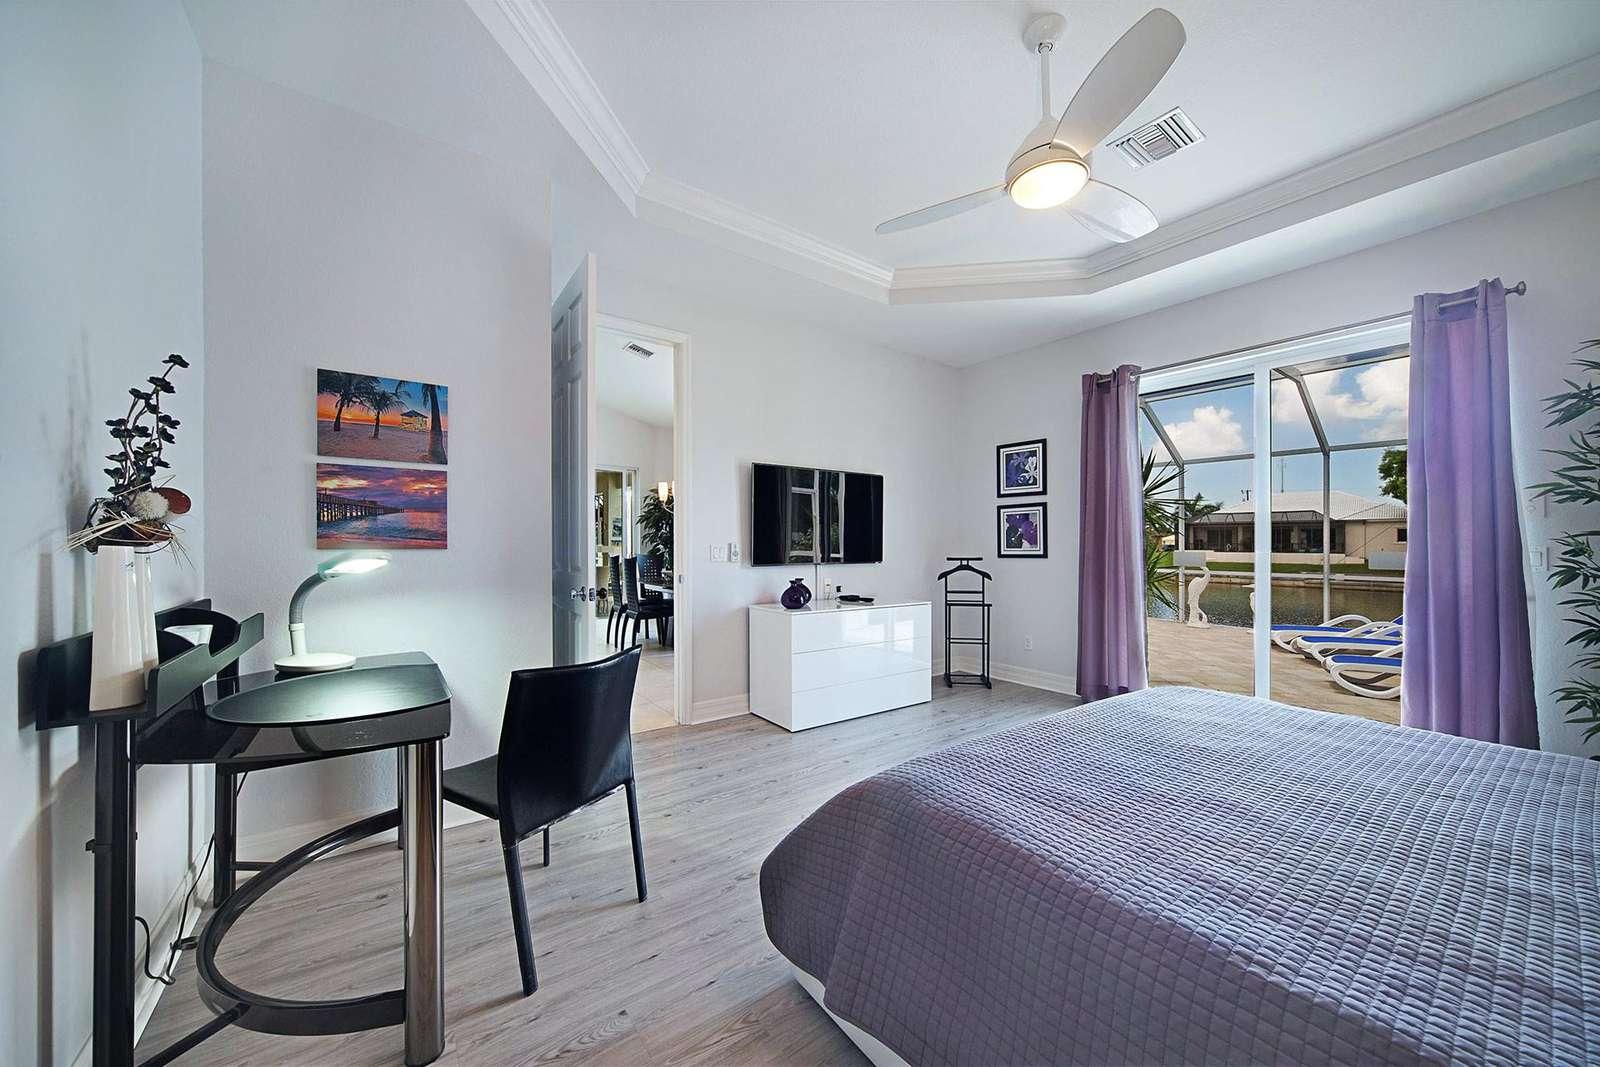 Florida Home - Vacation Rentals Cape Coral I Property Management I Real Estate